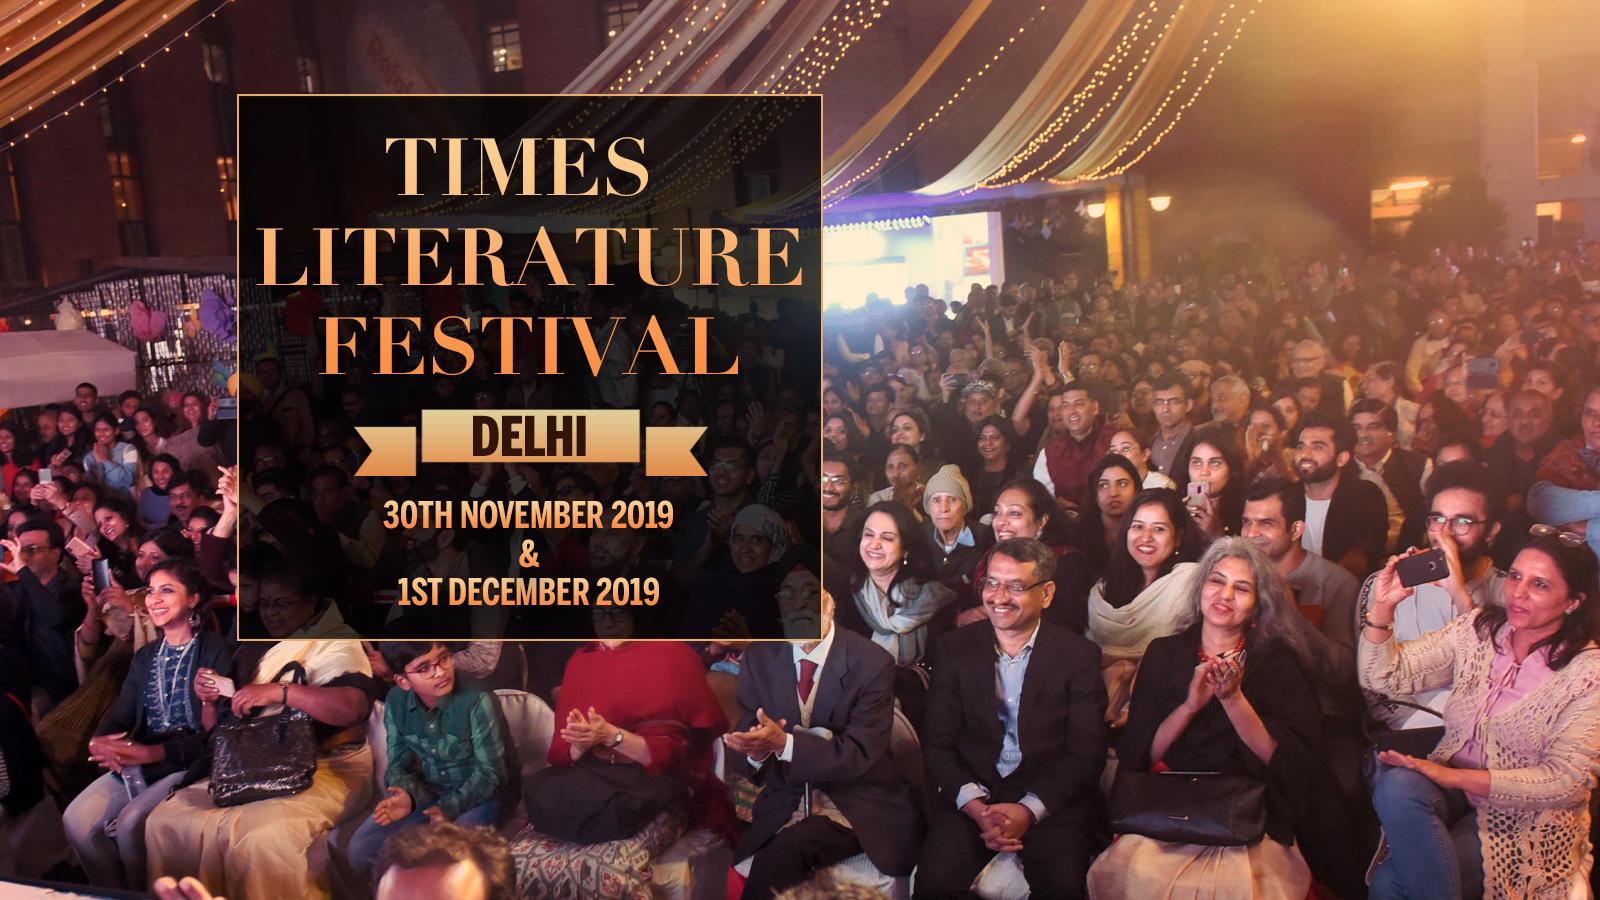 Times LitFest Delhi 2019